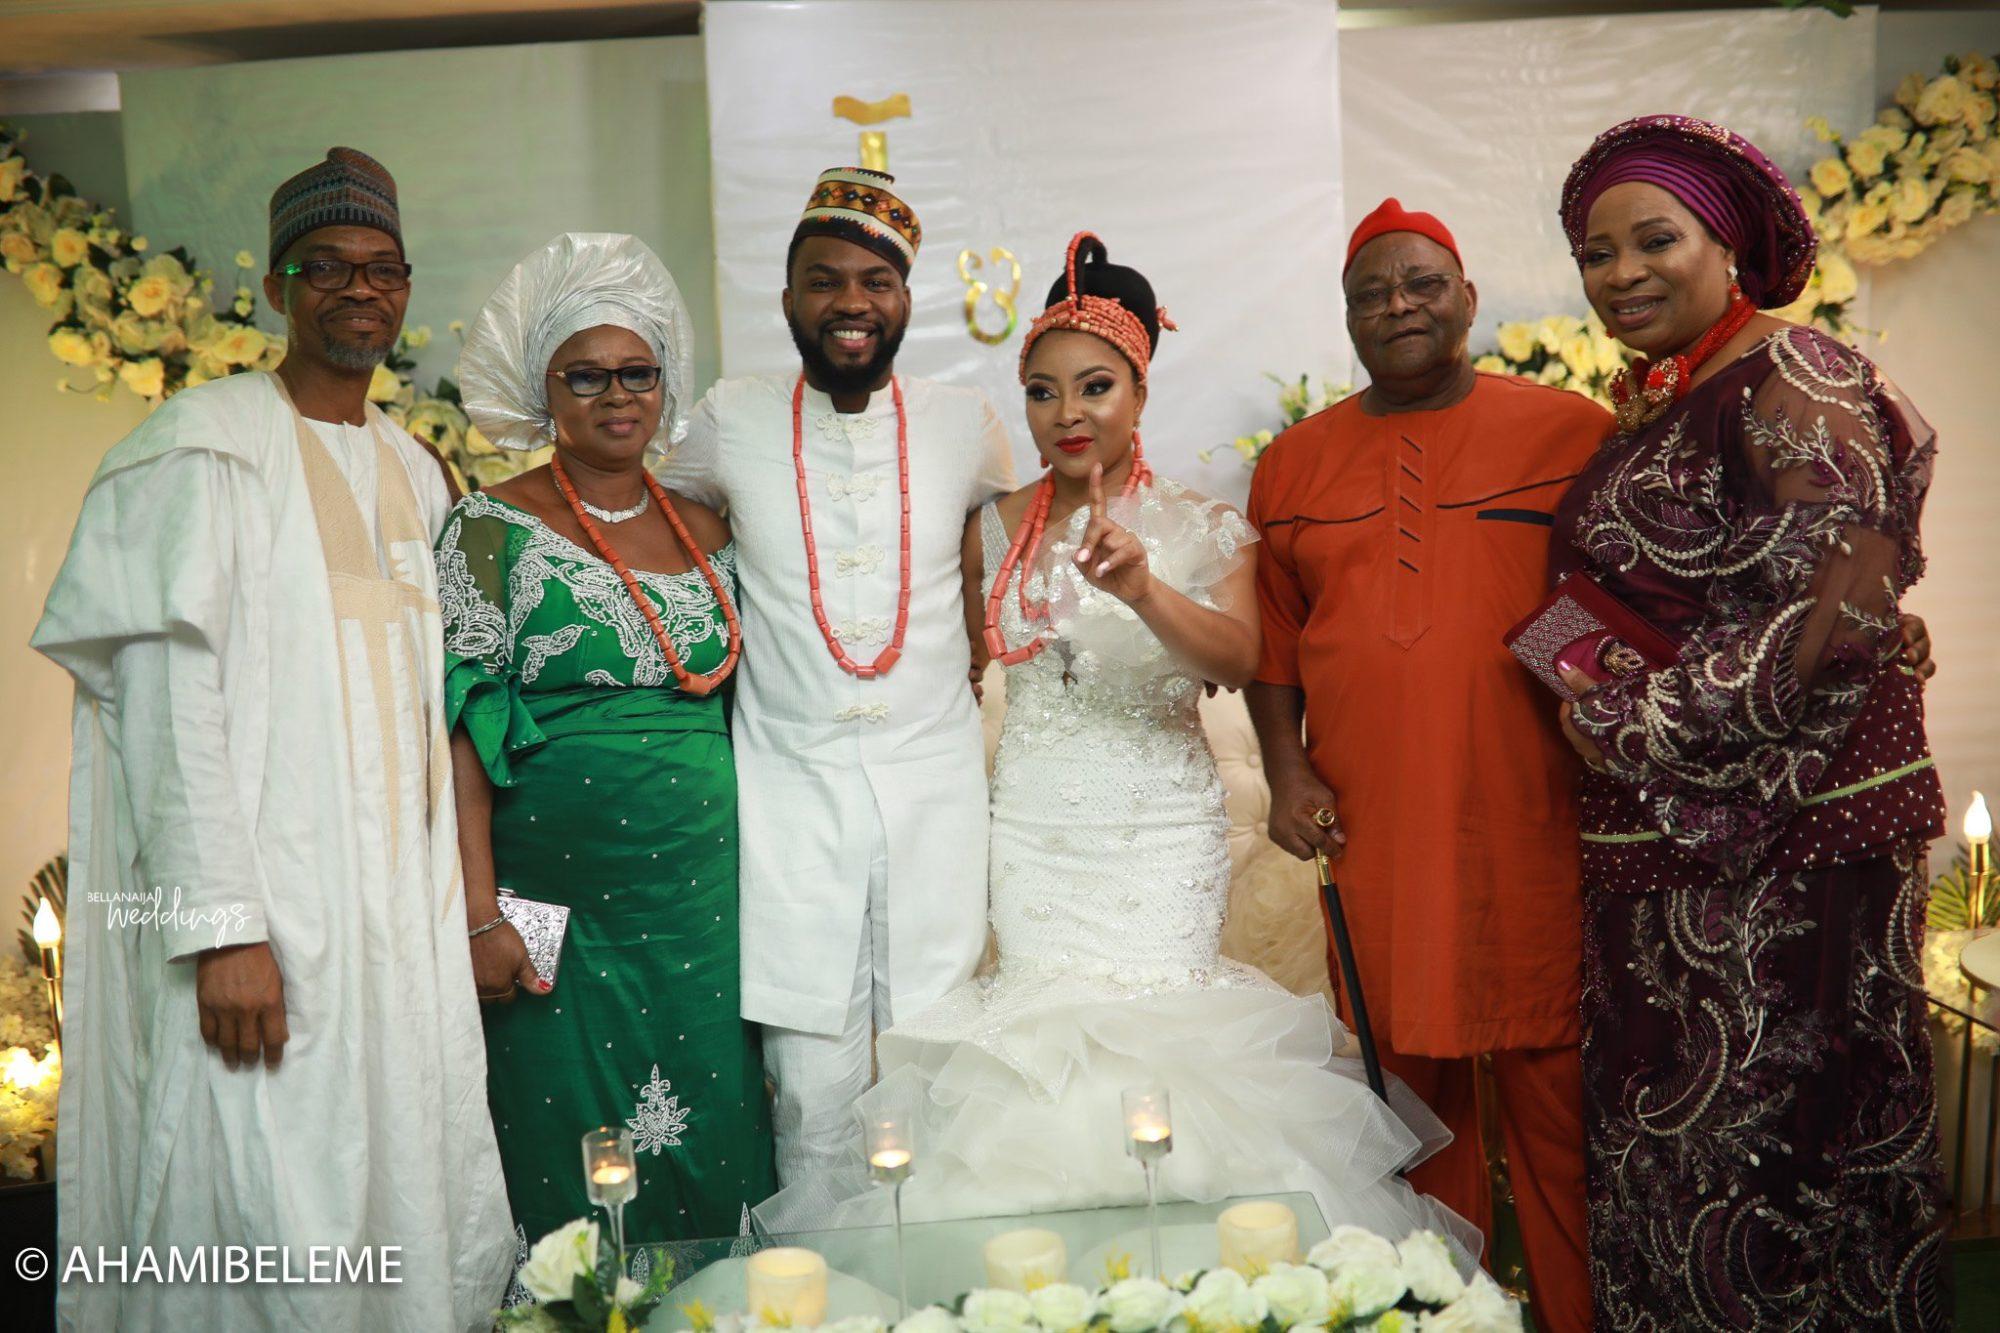 Linda Ejiofor Amp Ibrahim Suleiman S Traditional Wedding Had